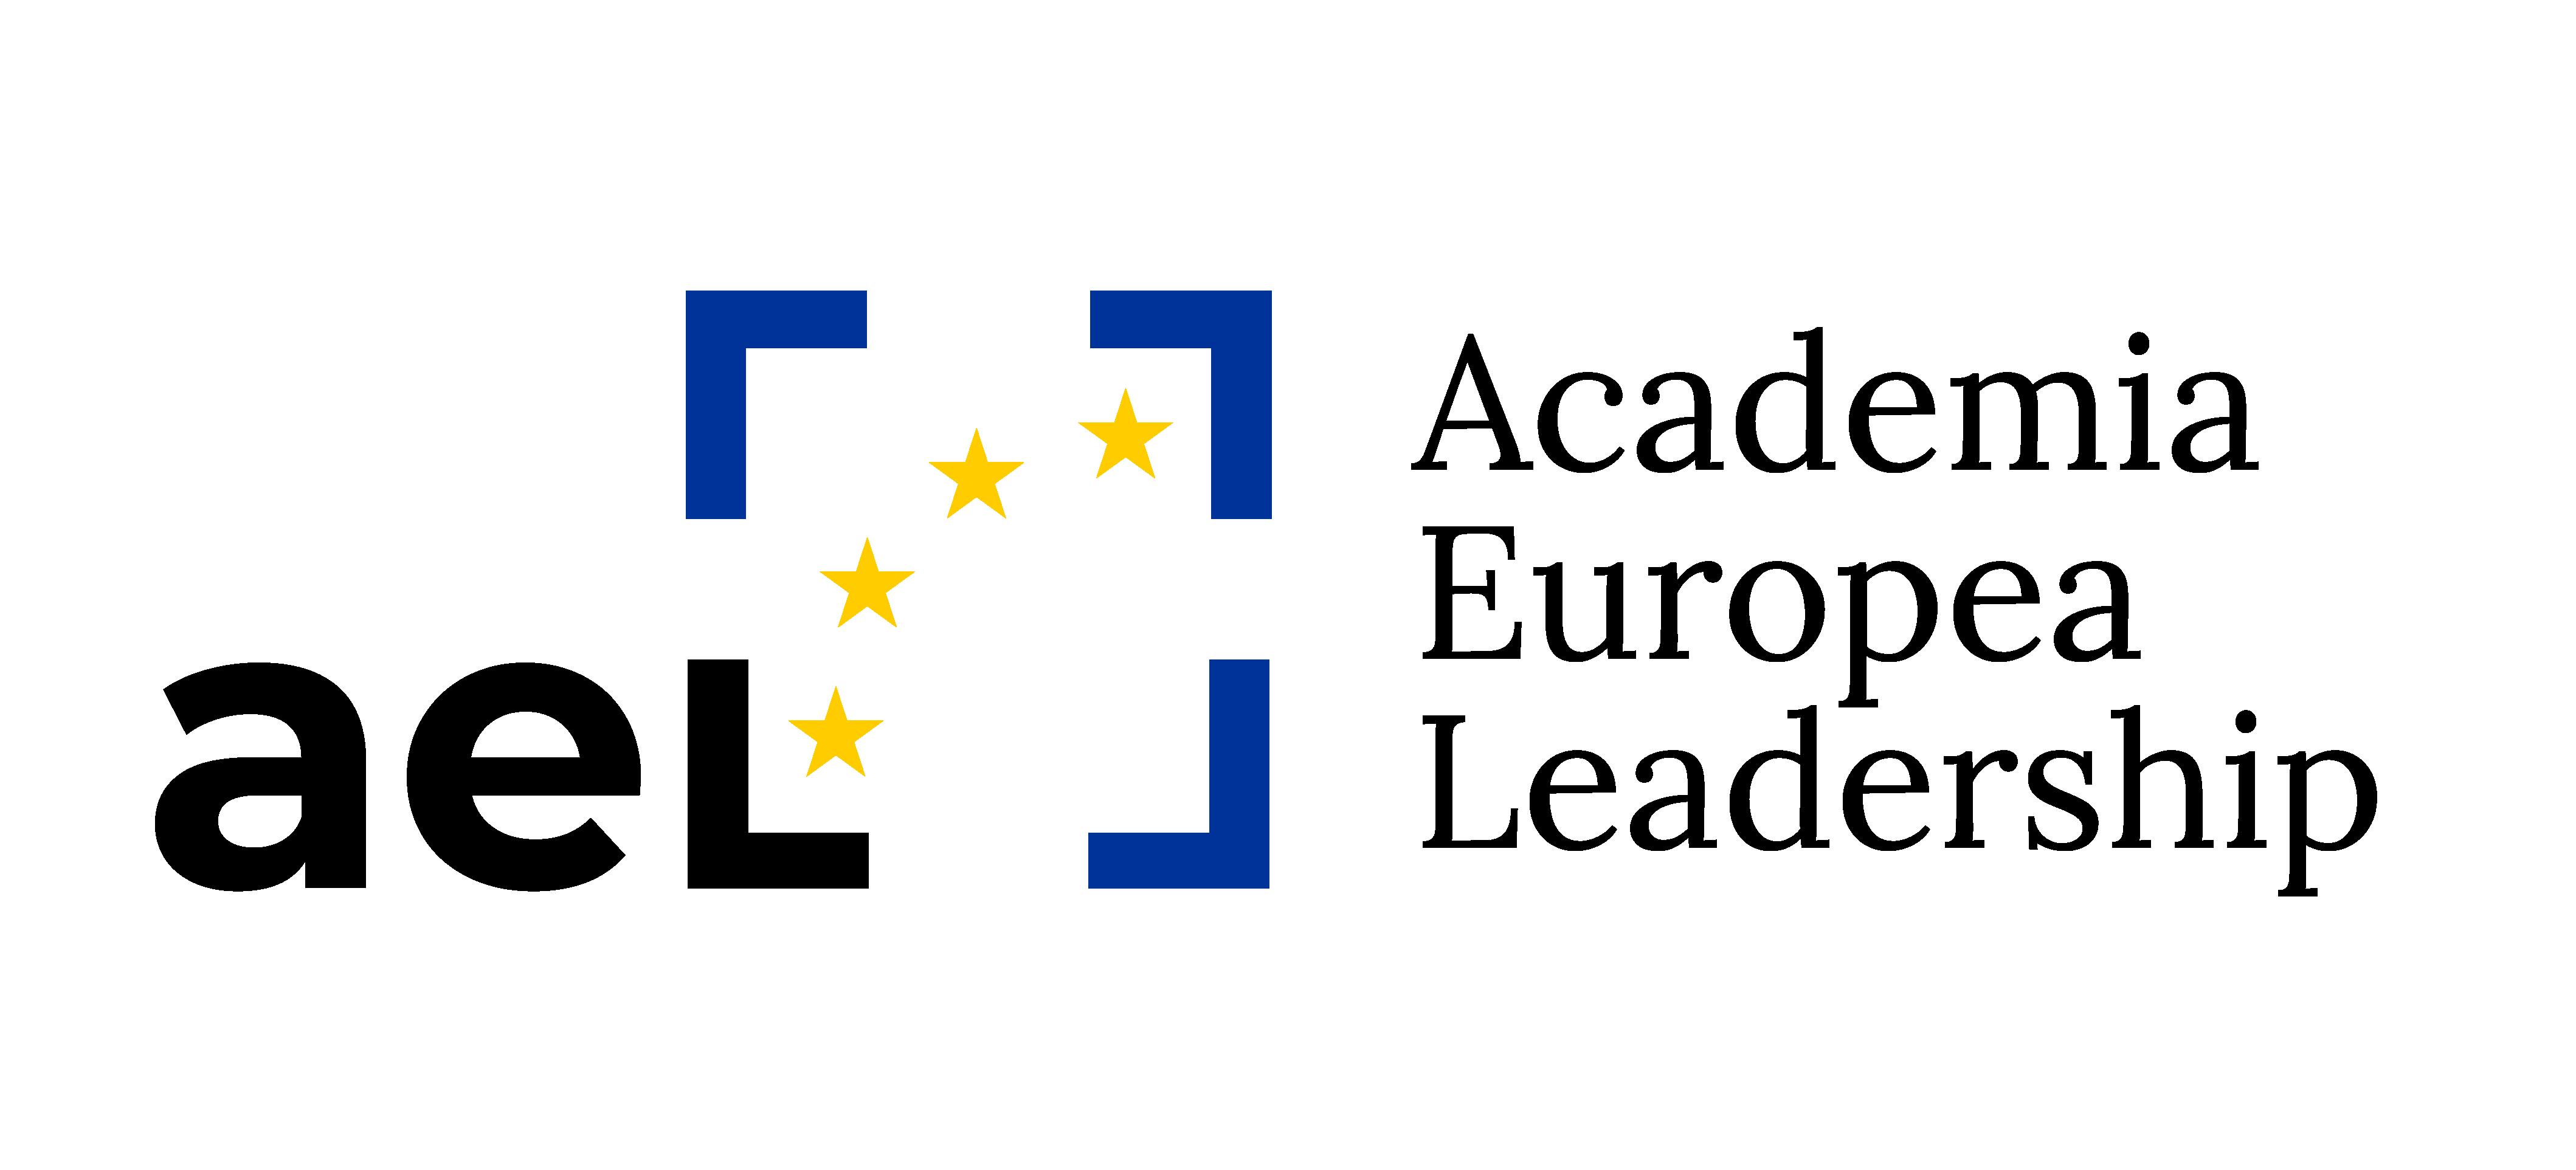 Academia Europea Leaderships